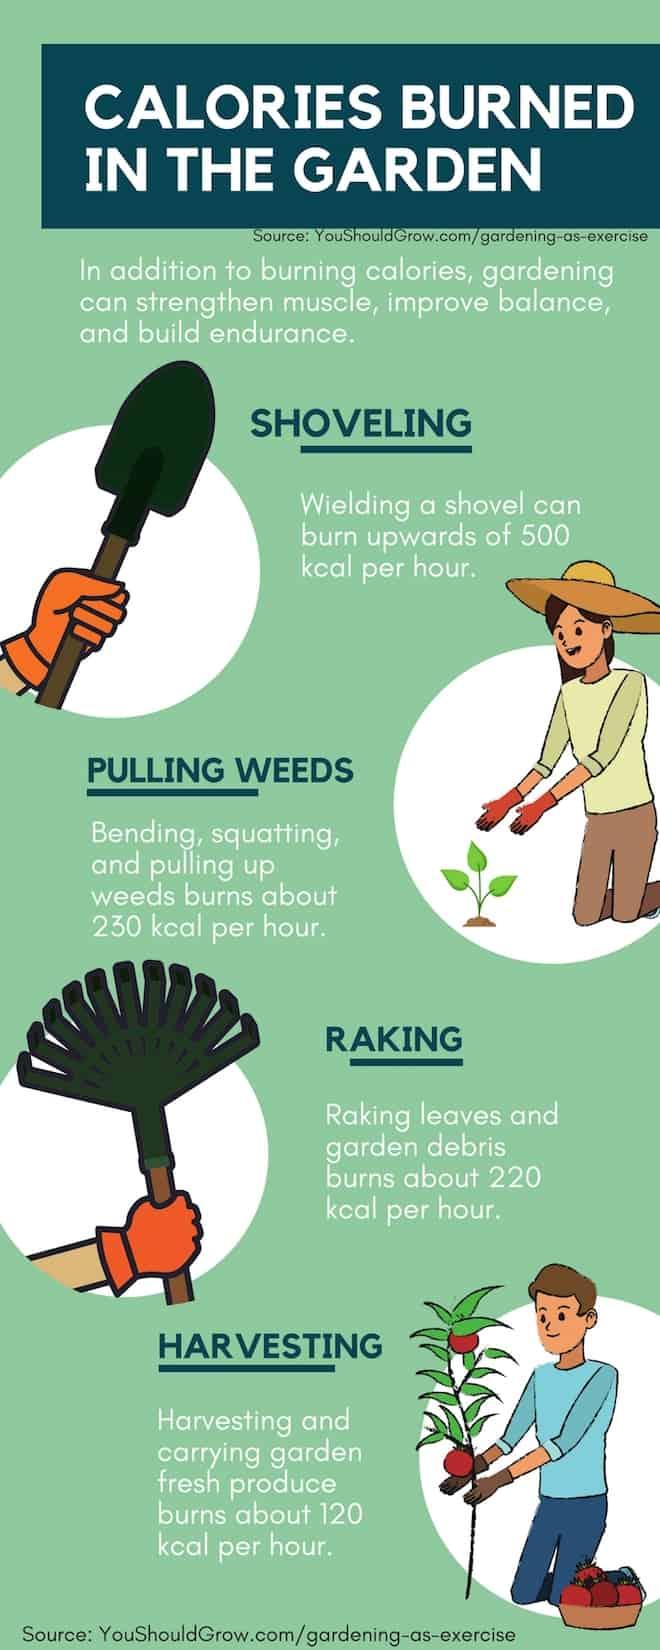 Gardening Tips: Calories burned when gardening as exercise.